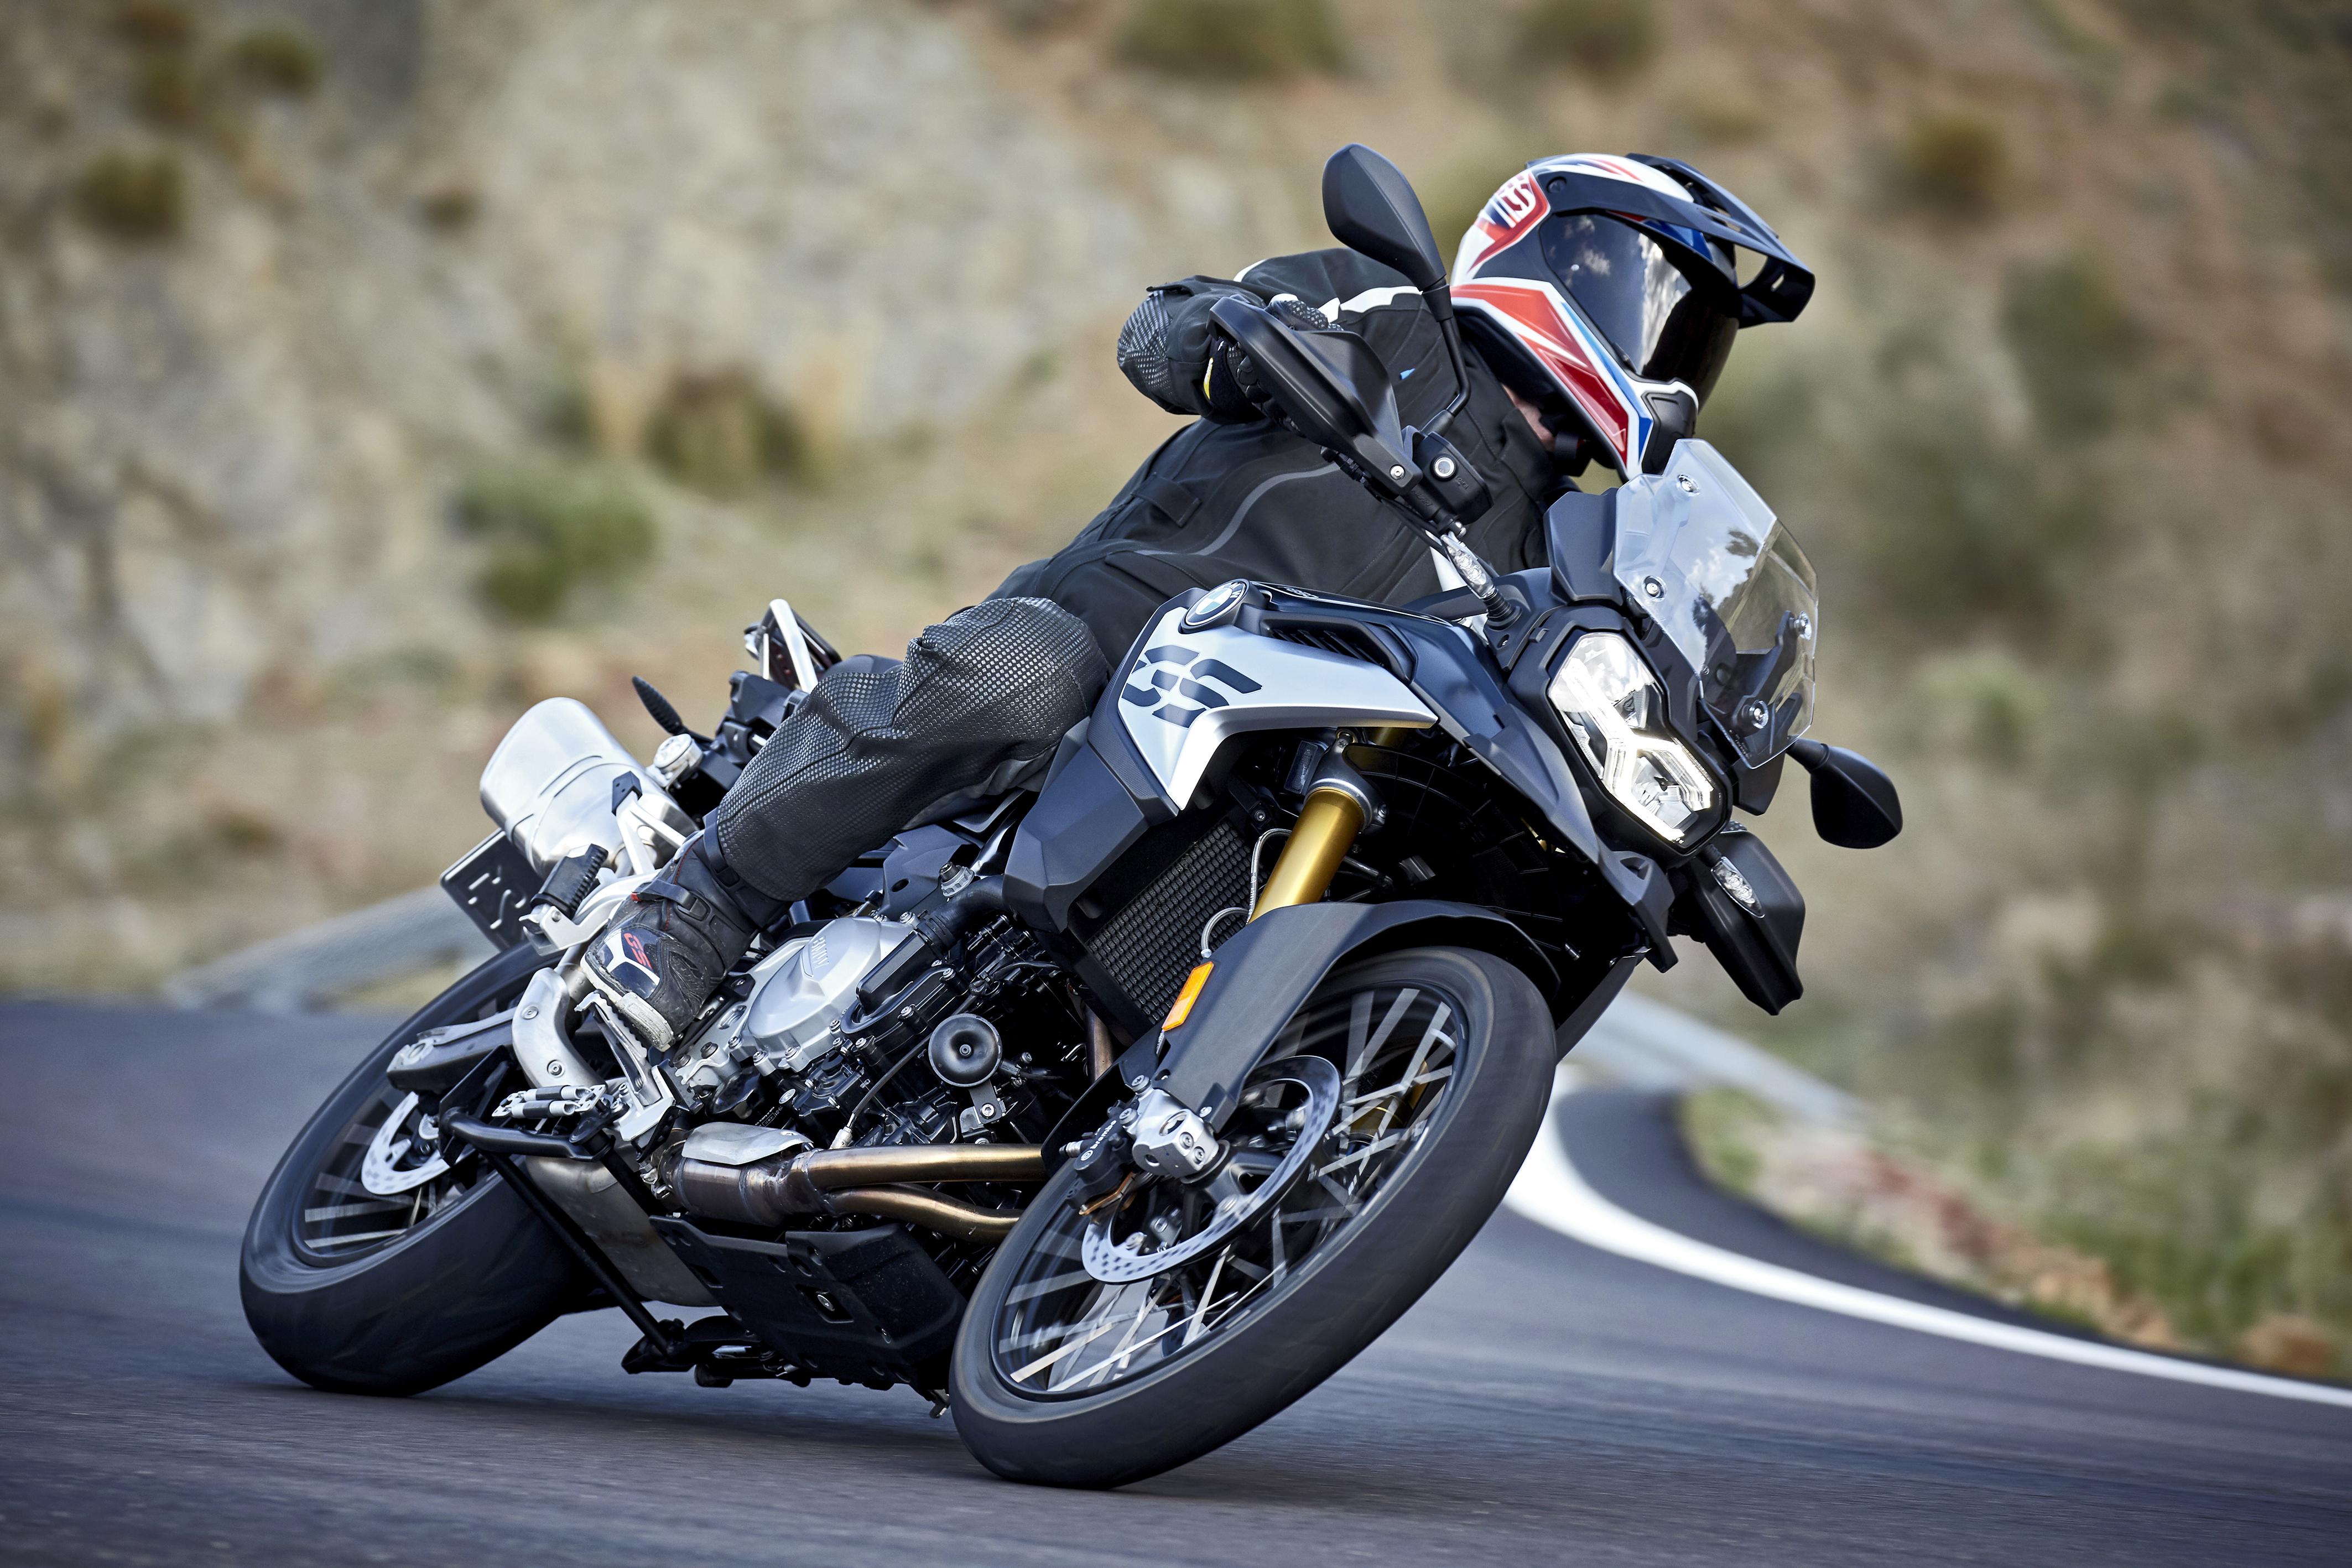 BIKES: BMW Motorrad Malaysia Introduces New BMW F 850 GS